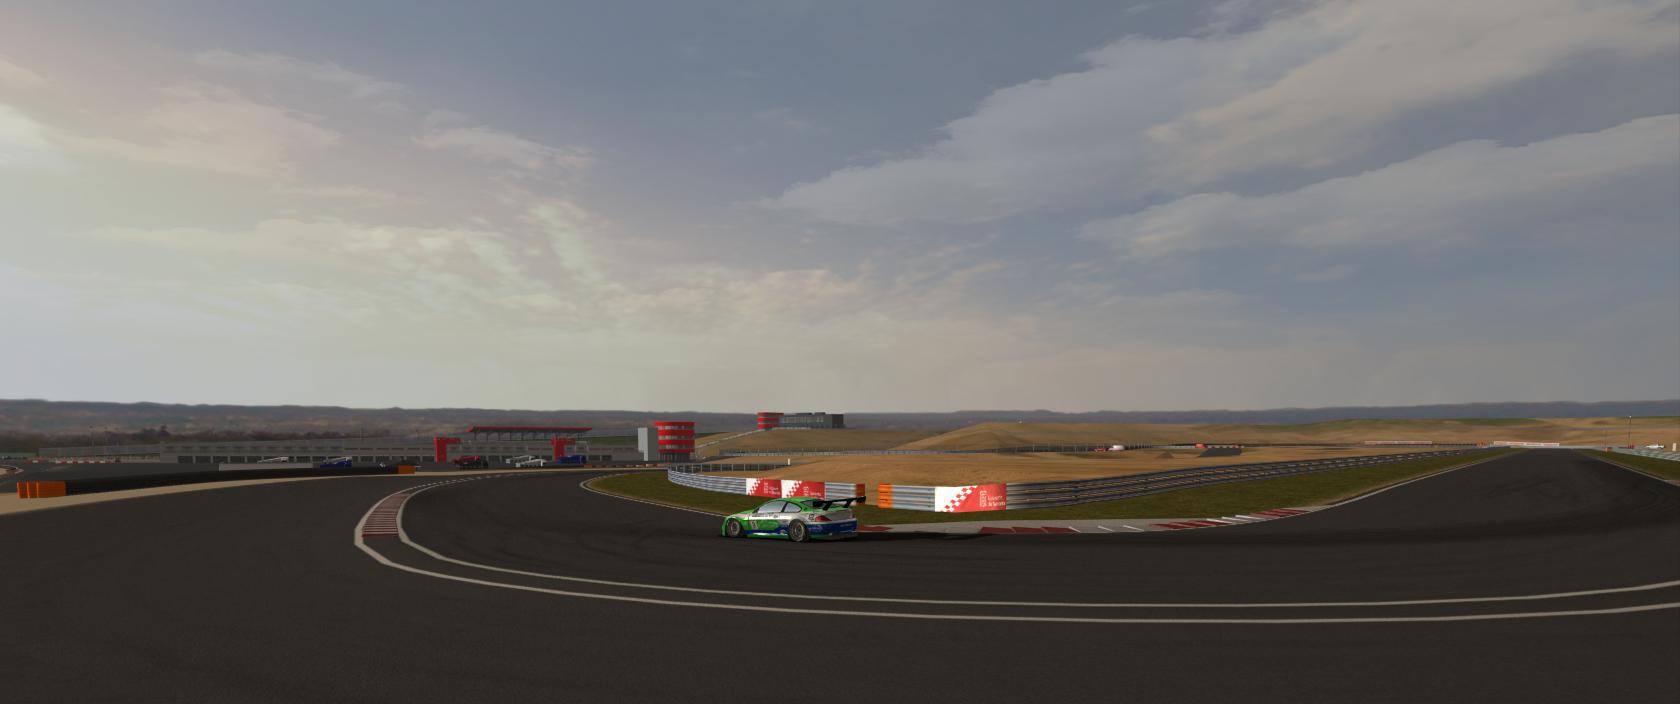 Circuito Navarra : Circuito de navarra u previews u virtualr u independent